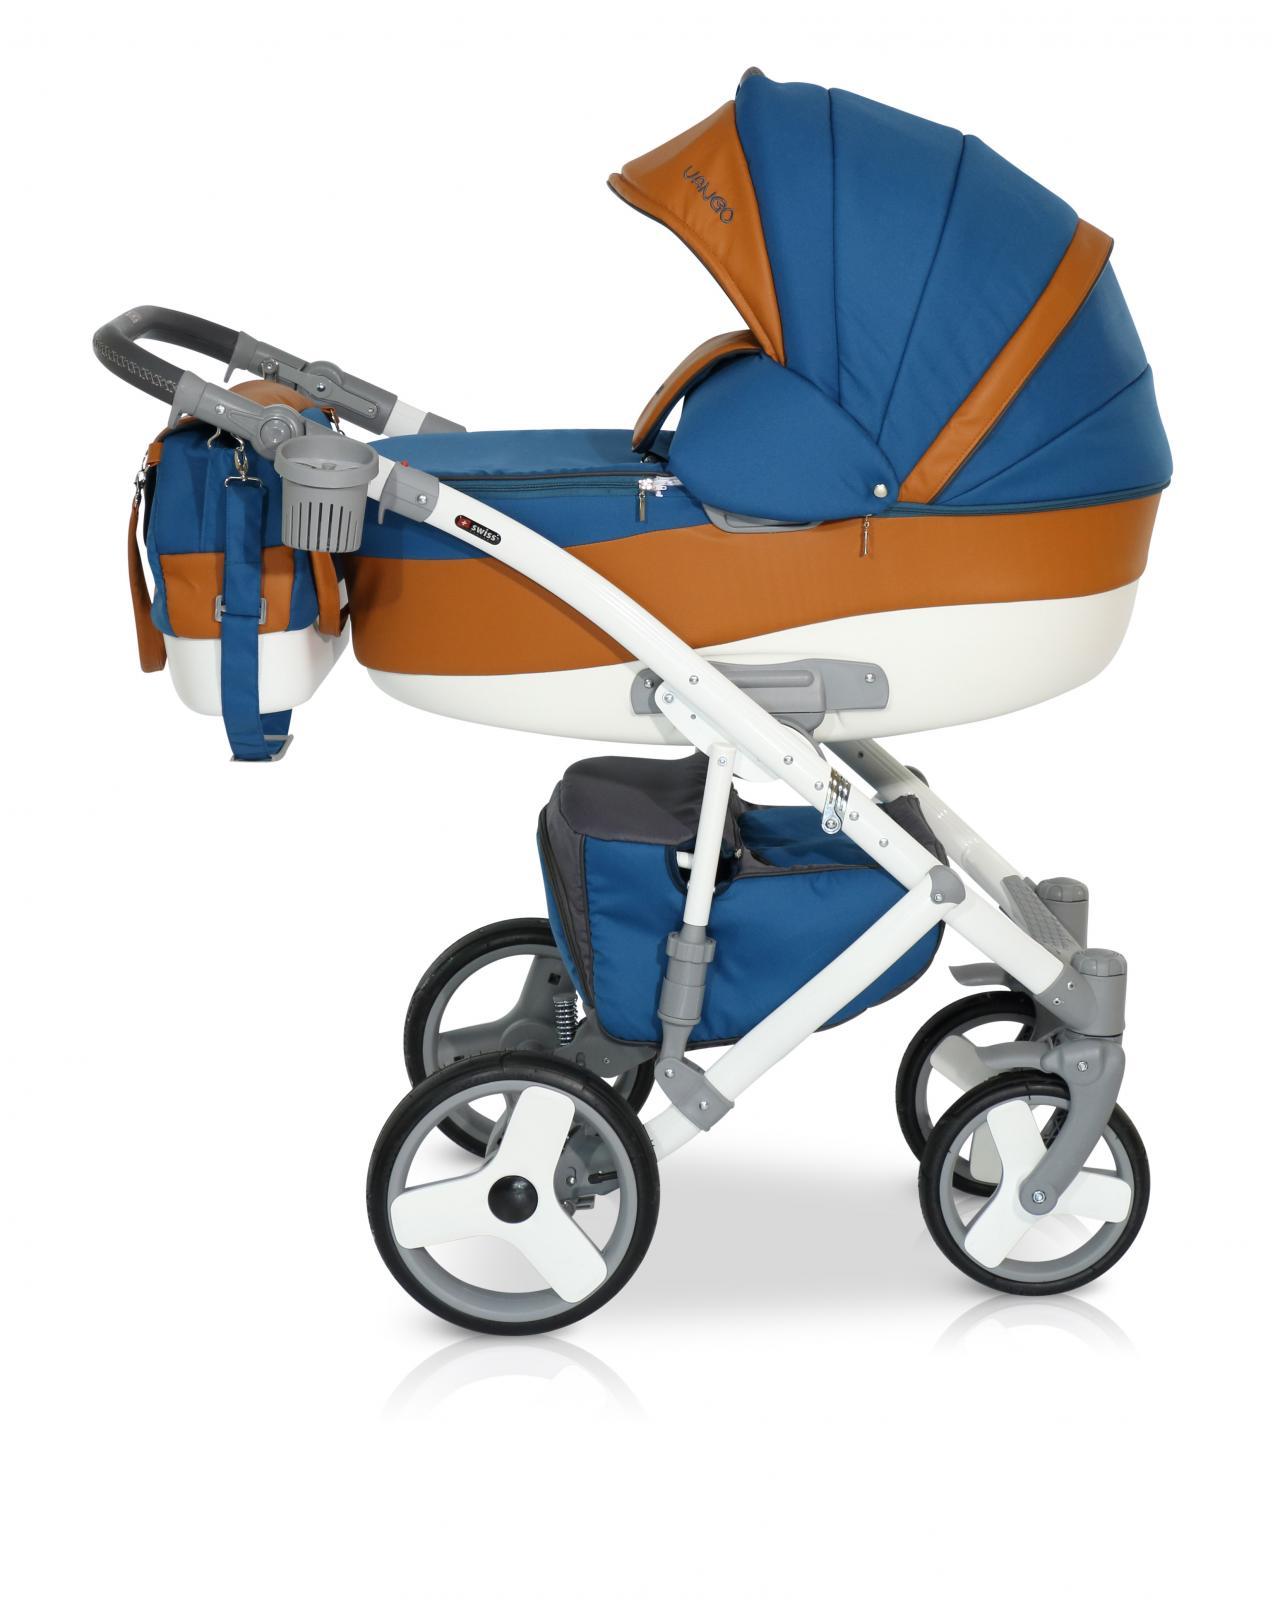 Kinderwagen Eco Baby Pram Buggy 3in1 Autositz Trageschale Set | eBay